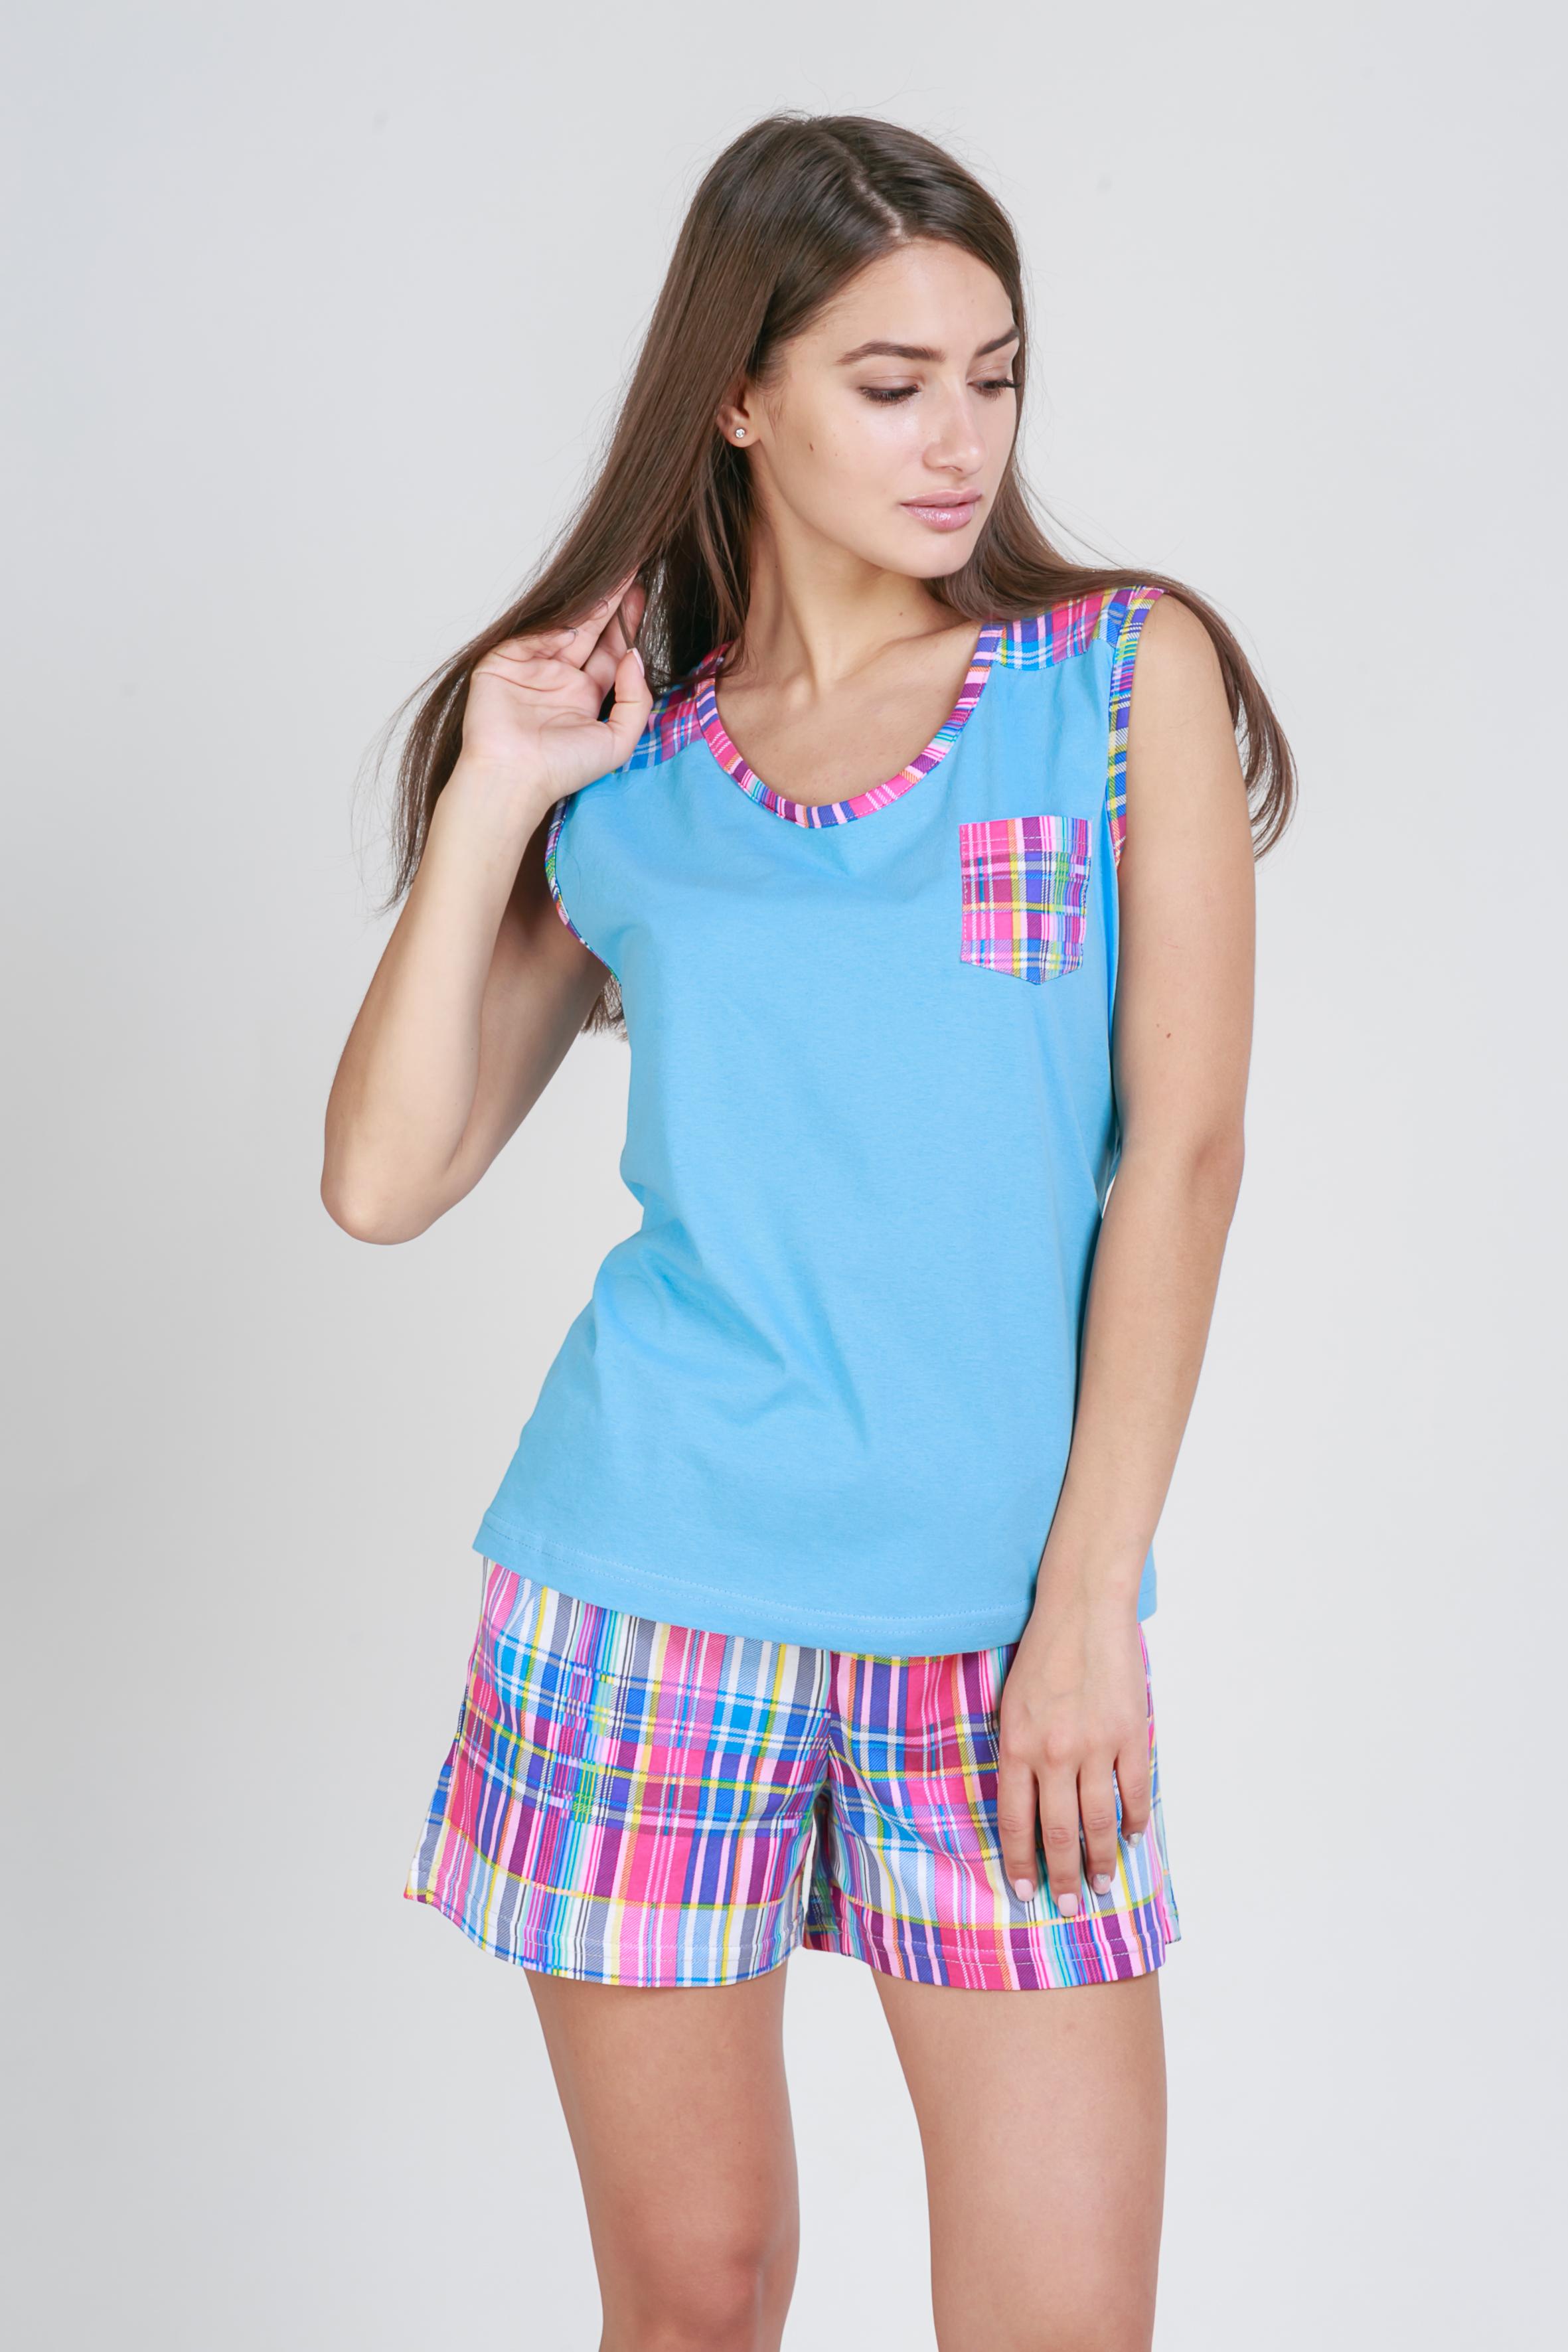 Пижамы Pastilla Пижама Сорренто (L) пижама жен mia cara майка шорты botanical aw15 ubl lst 264 р 42 44 1119503